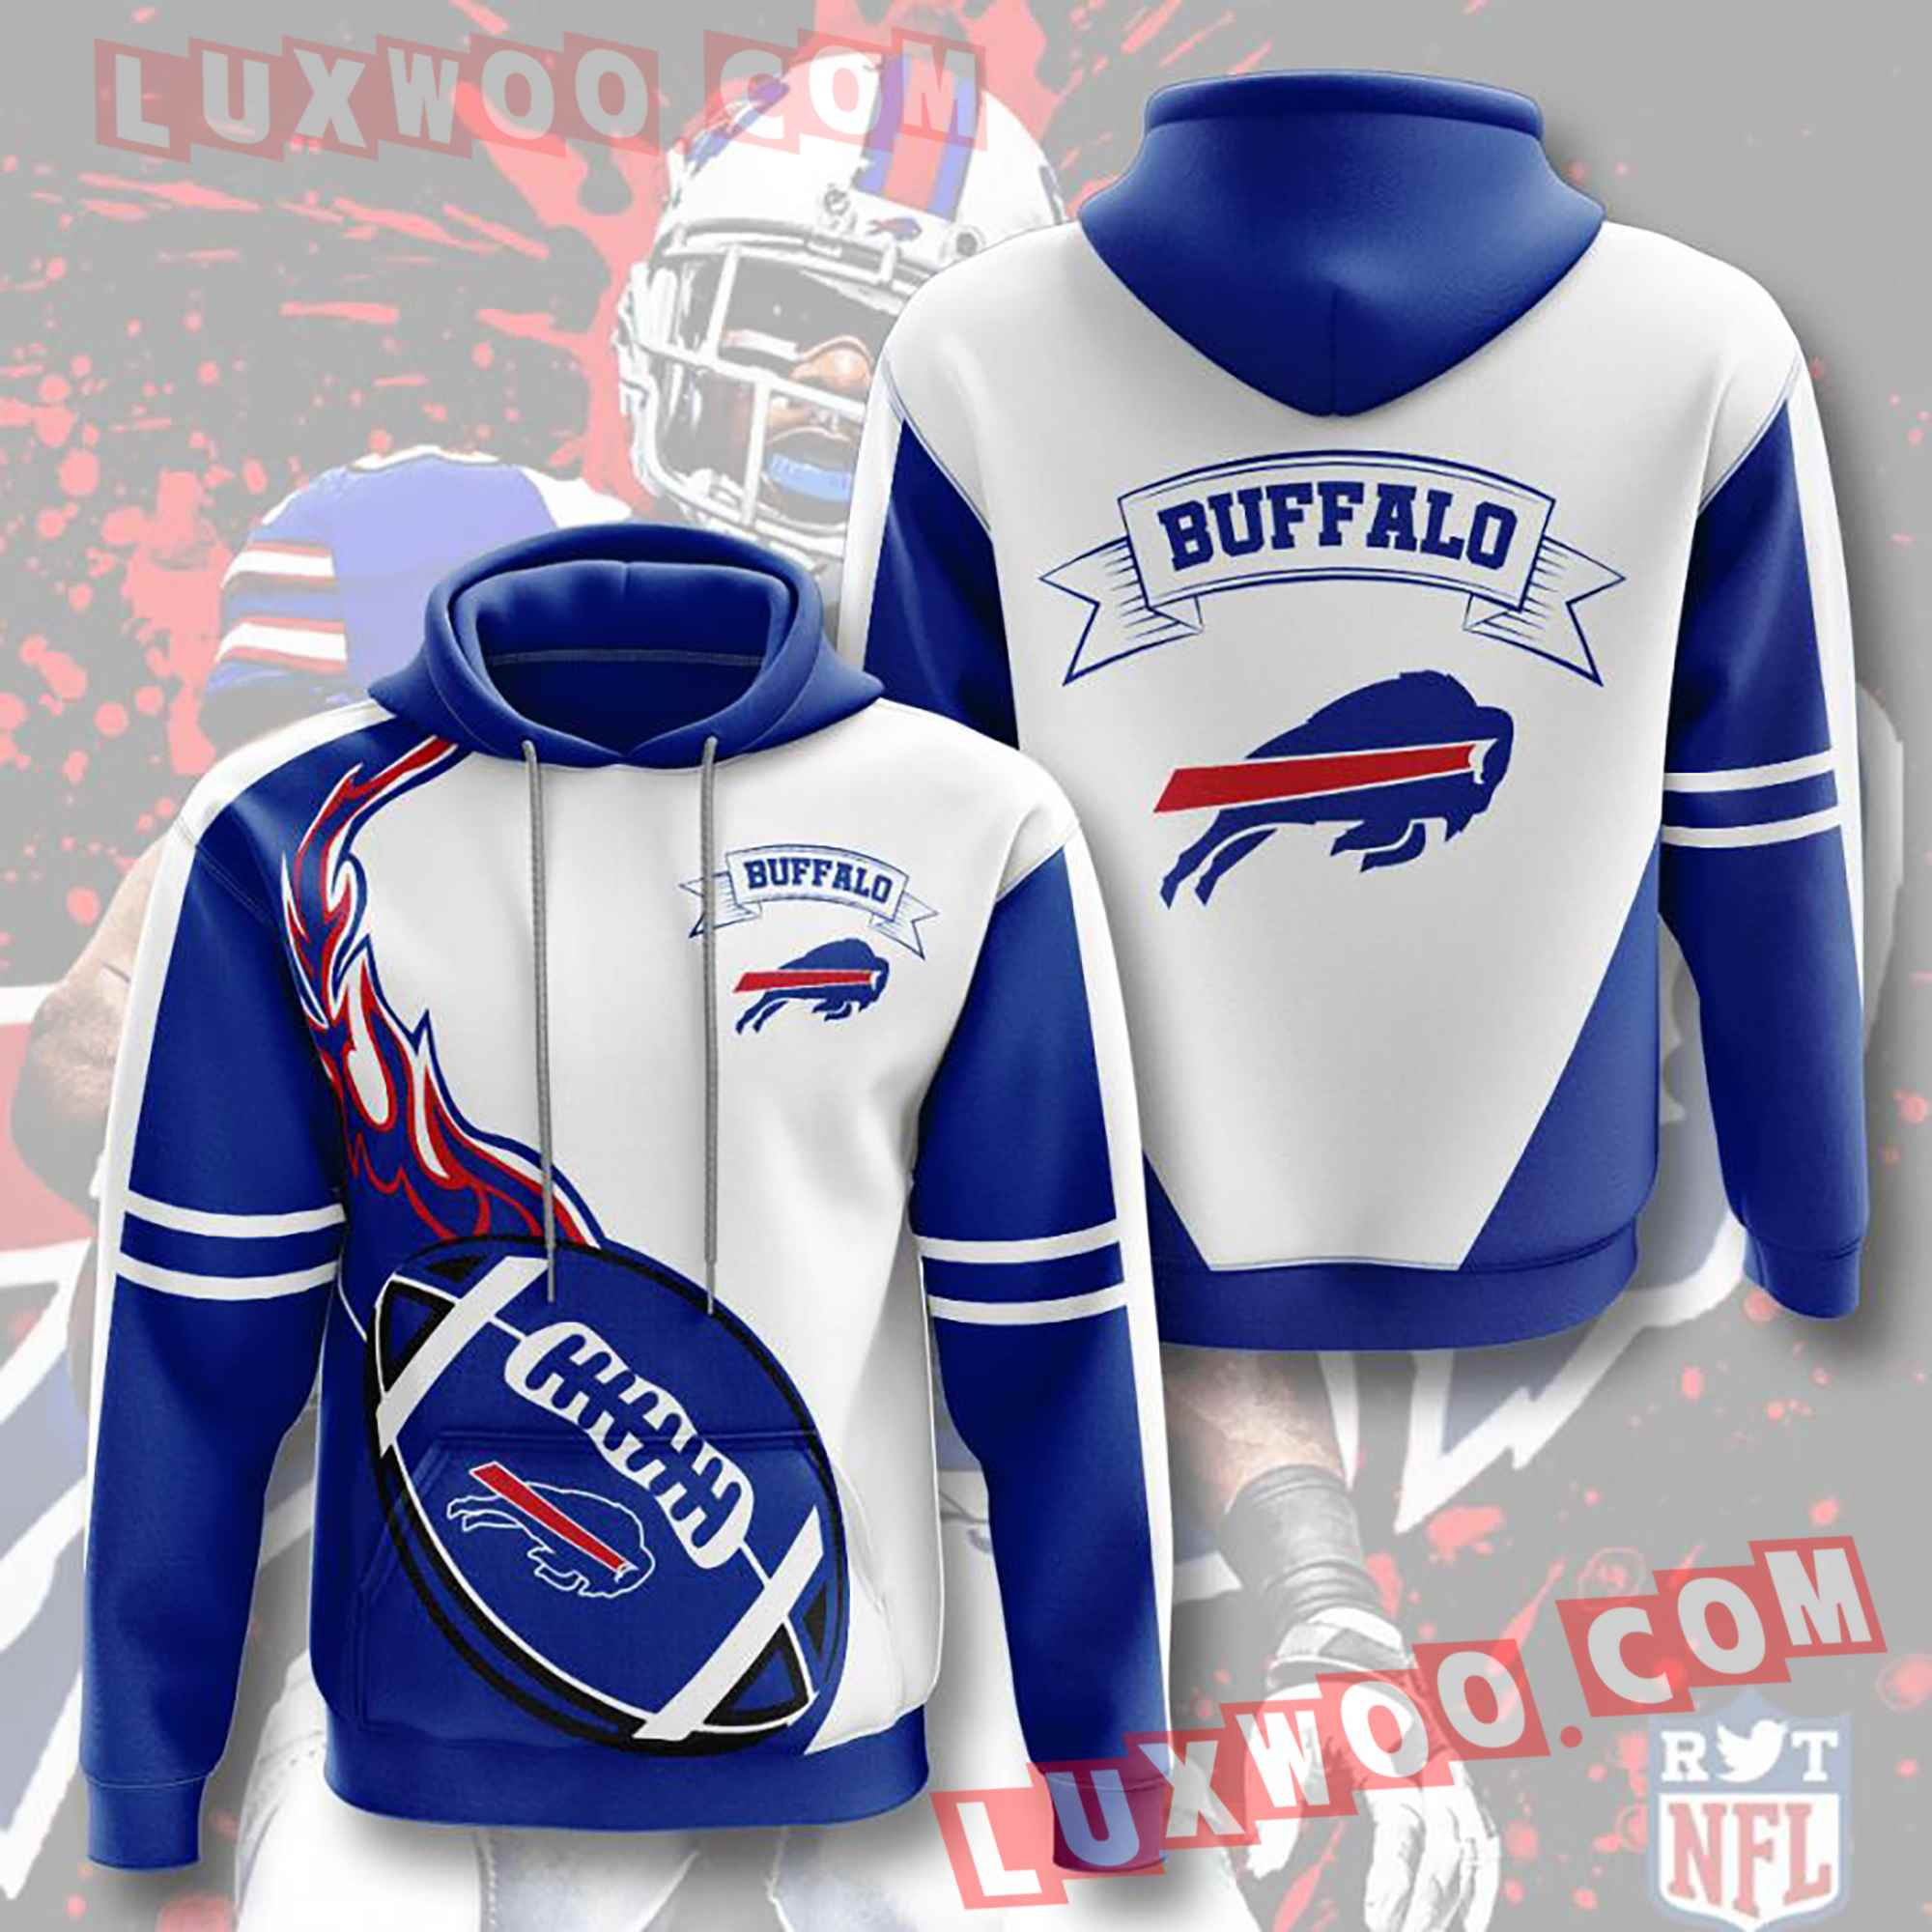 Nfl Buffalo Bills Hoodies Custom All Over Print 3d Pullover Hoodie V5